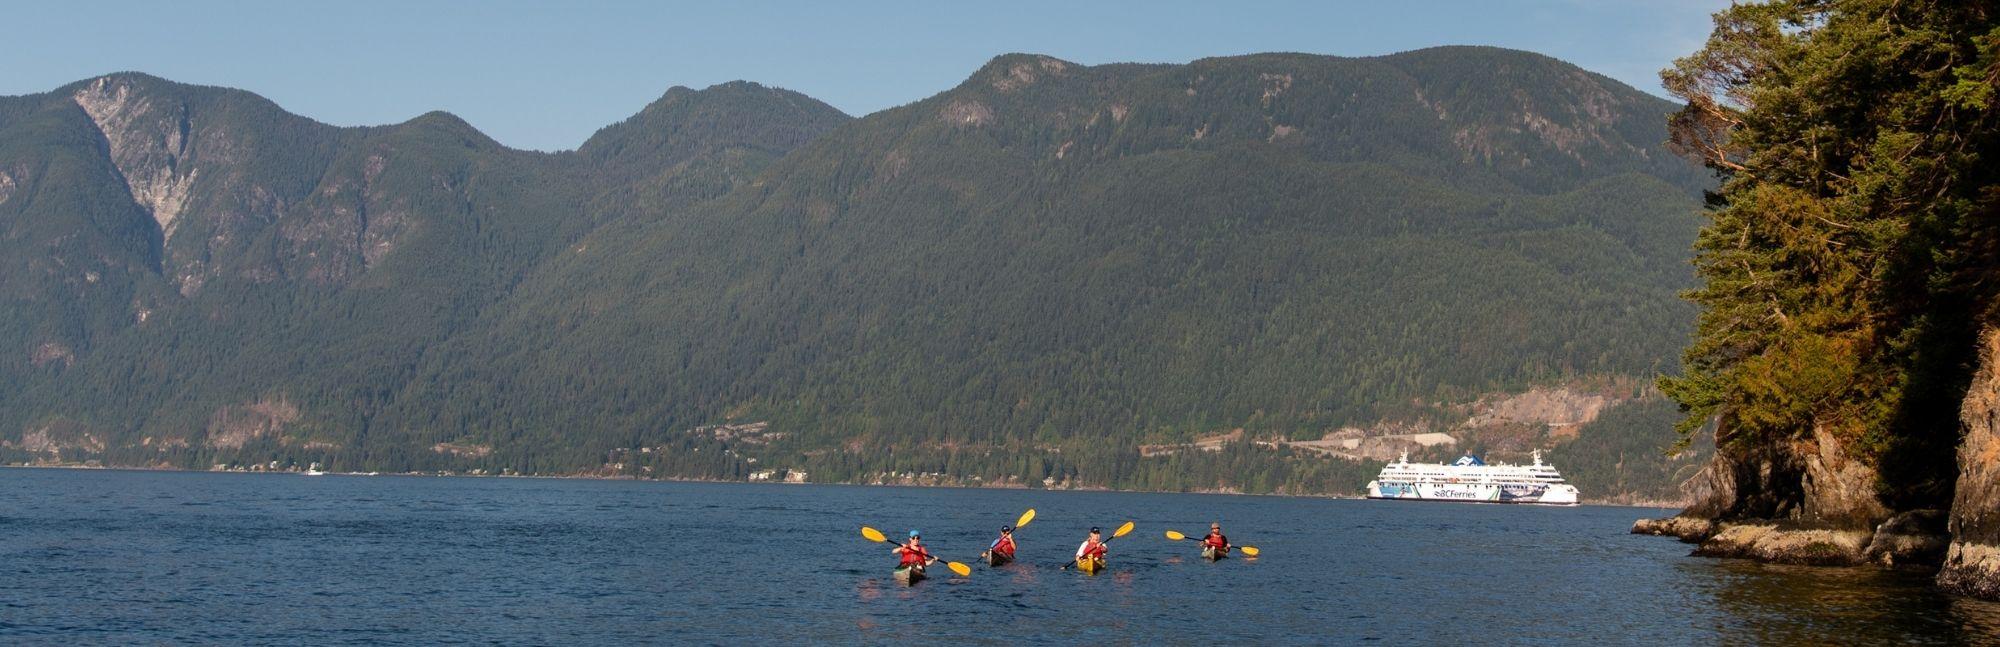 Átl'ka7tsem/Howe Sound UNESCO Biosphere Region